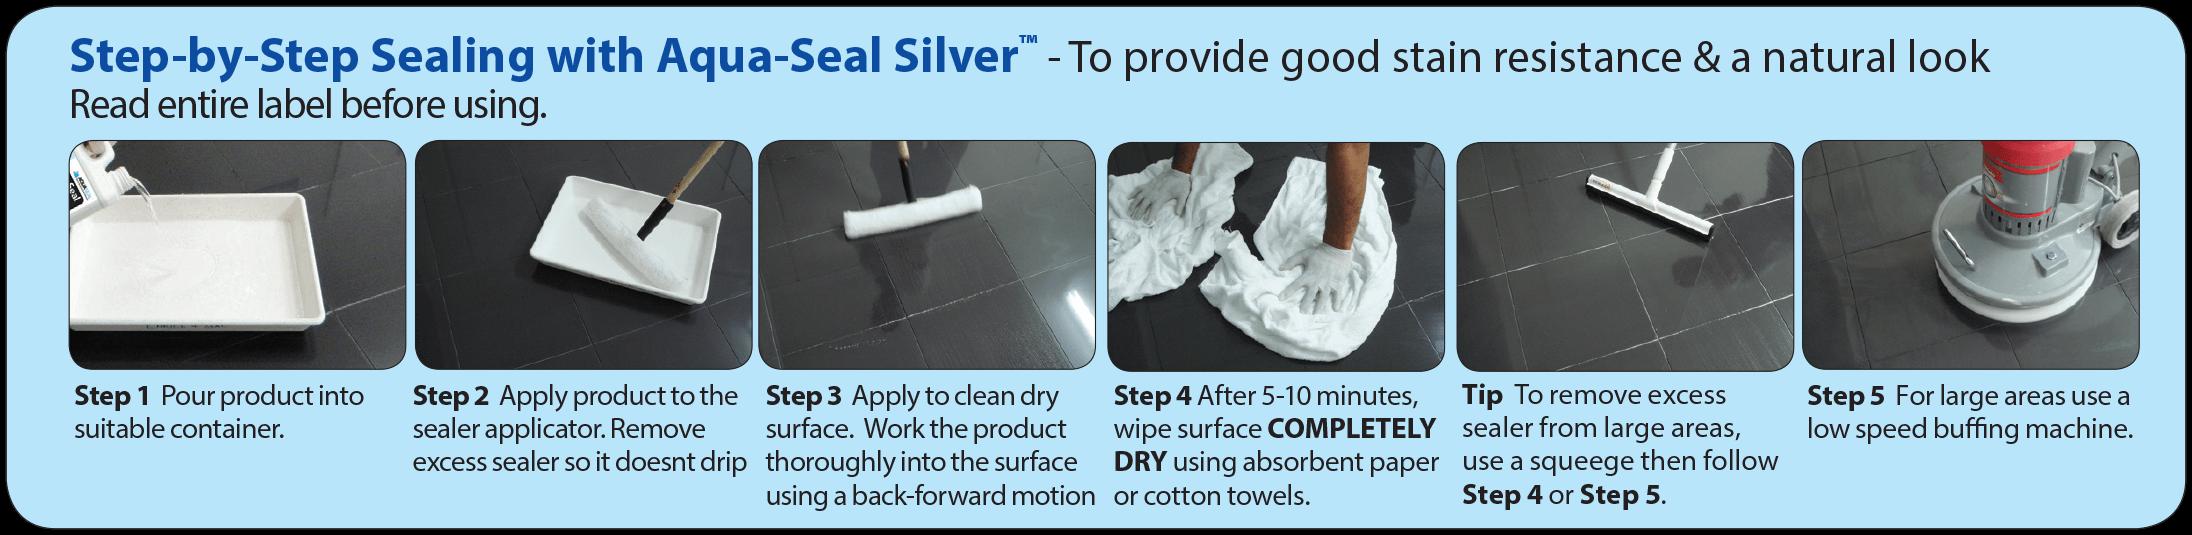 Sealers Plus Silver Procedure